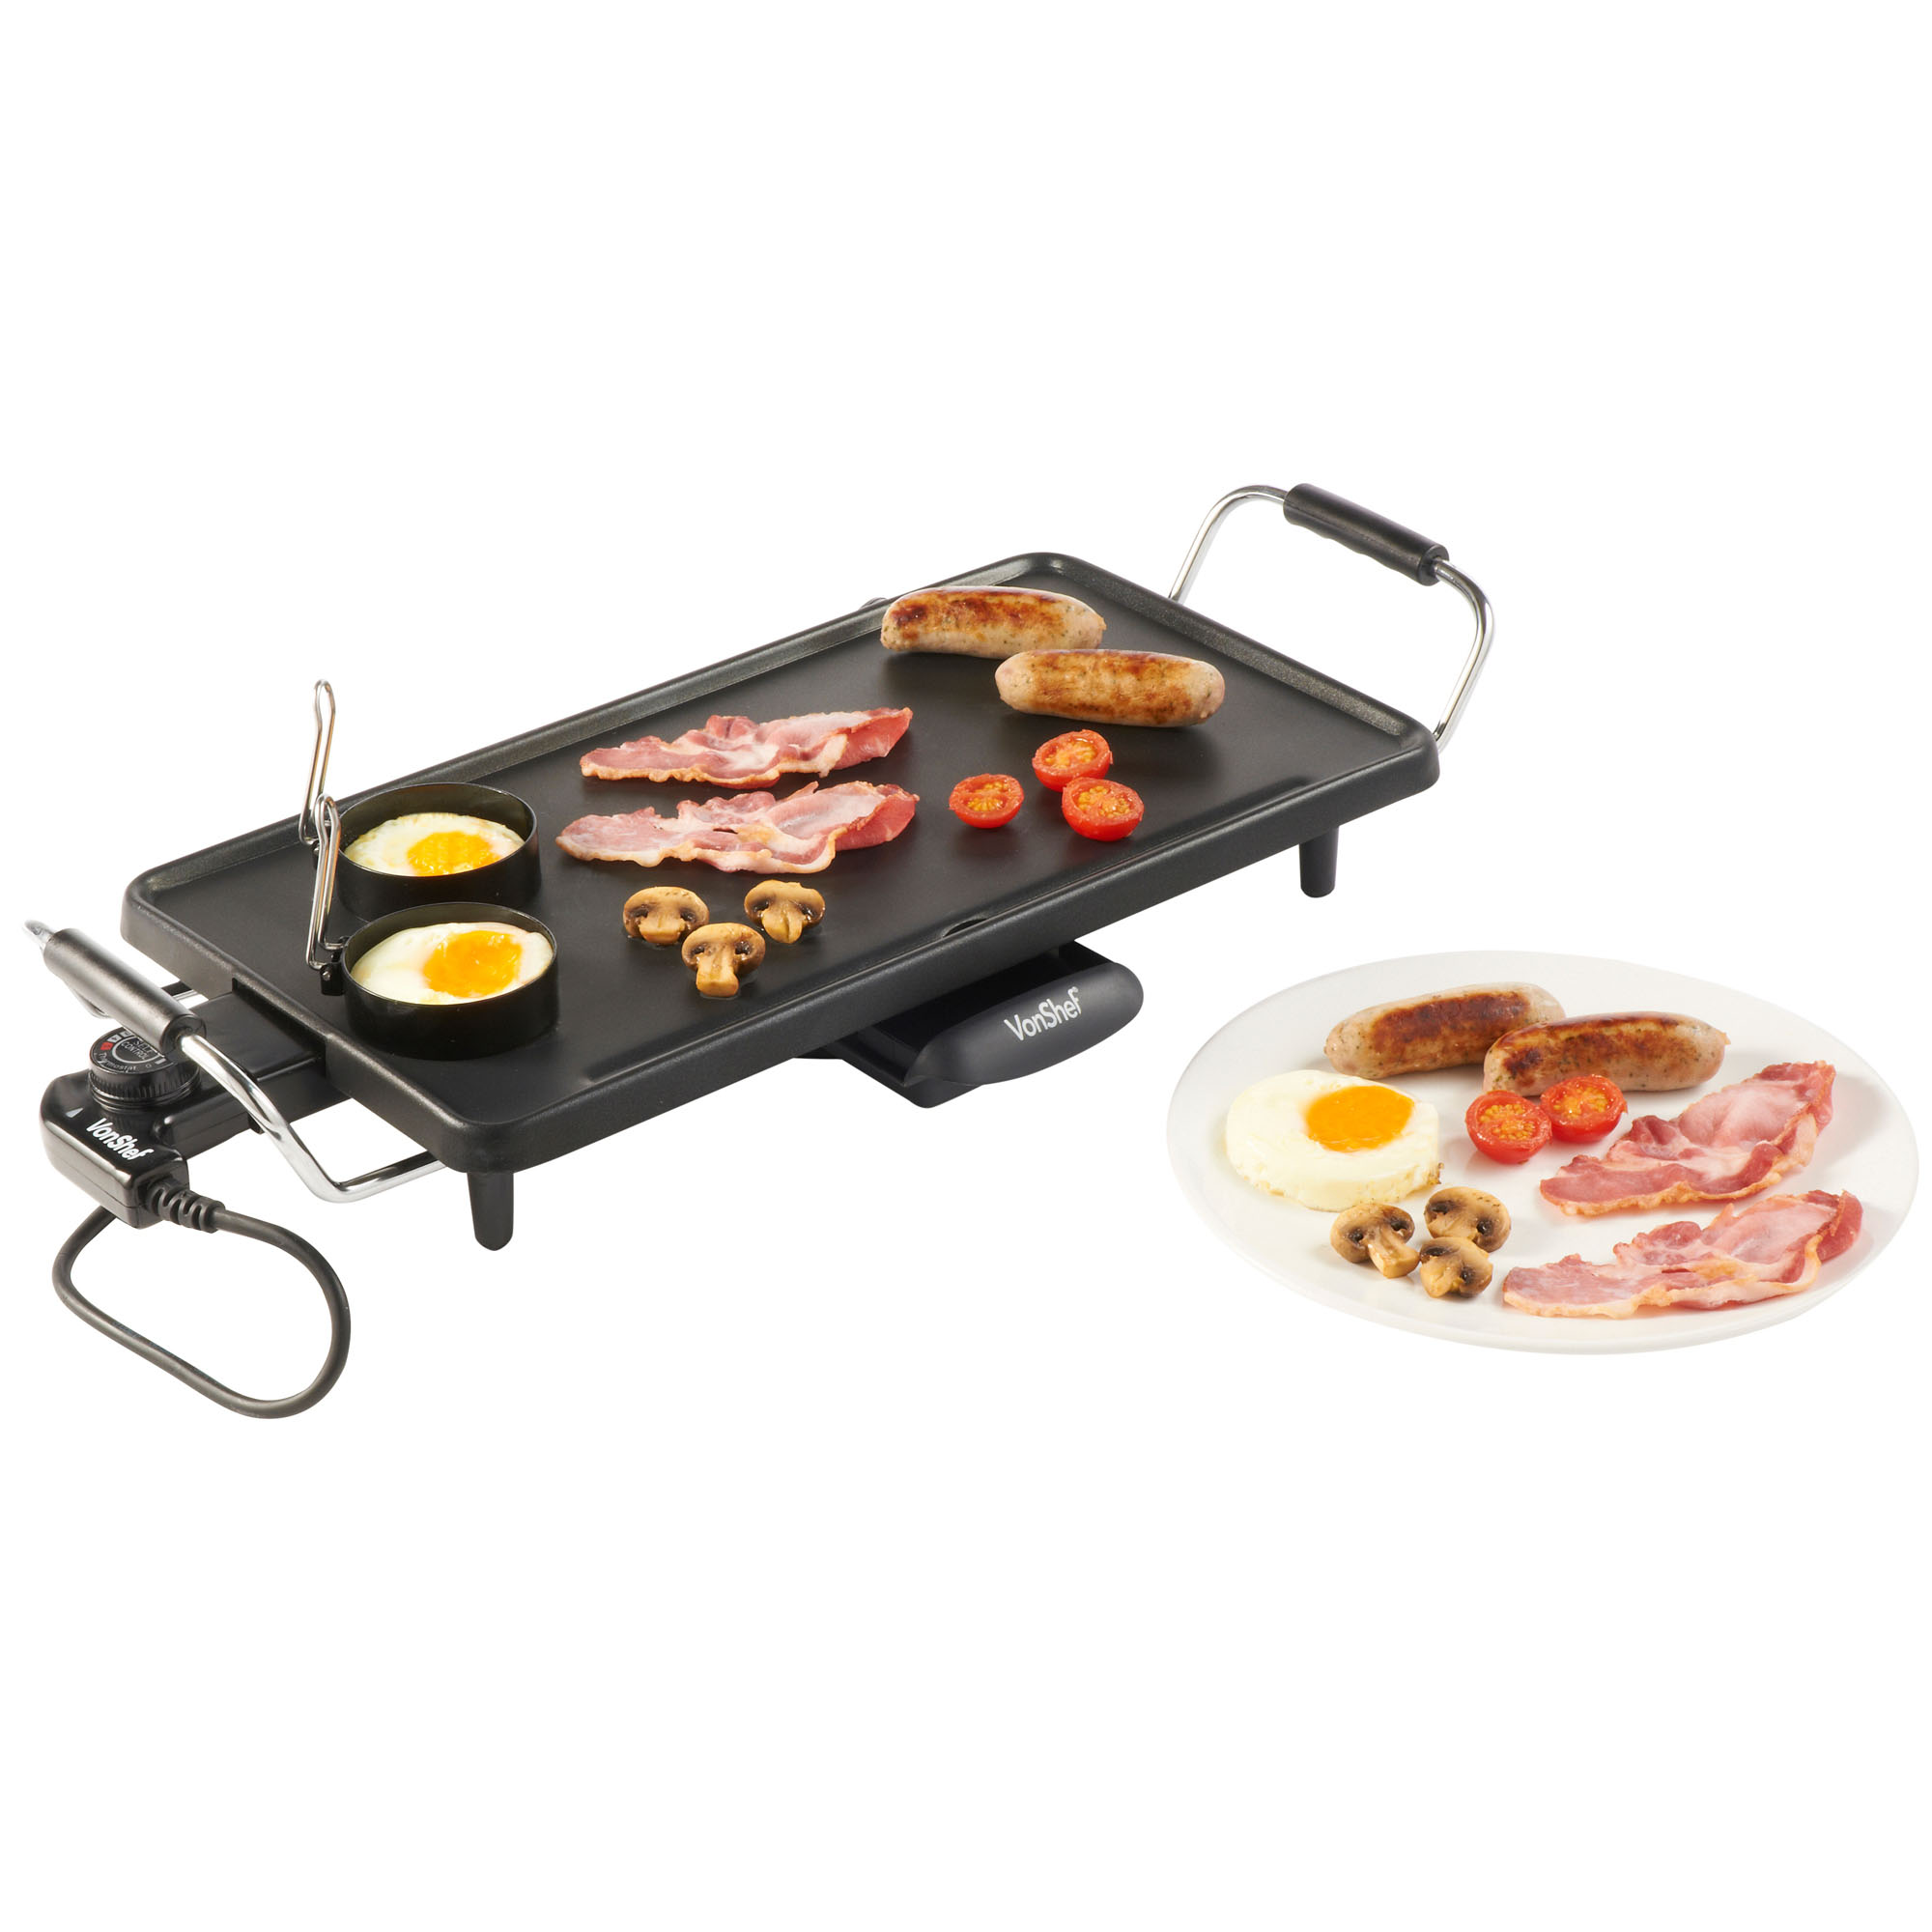 vonshef electric teppanyaki table top grill griddle bbq barbecue garden camping. Black Bedroom Furniture Sets. Home Design Ideas